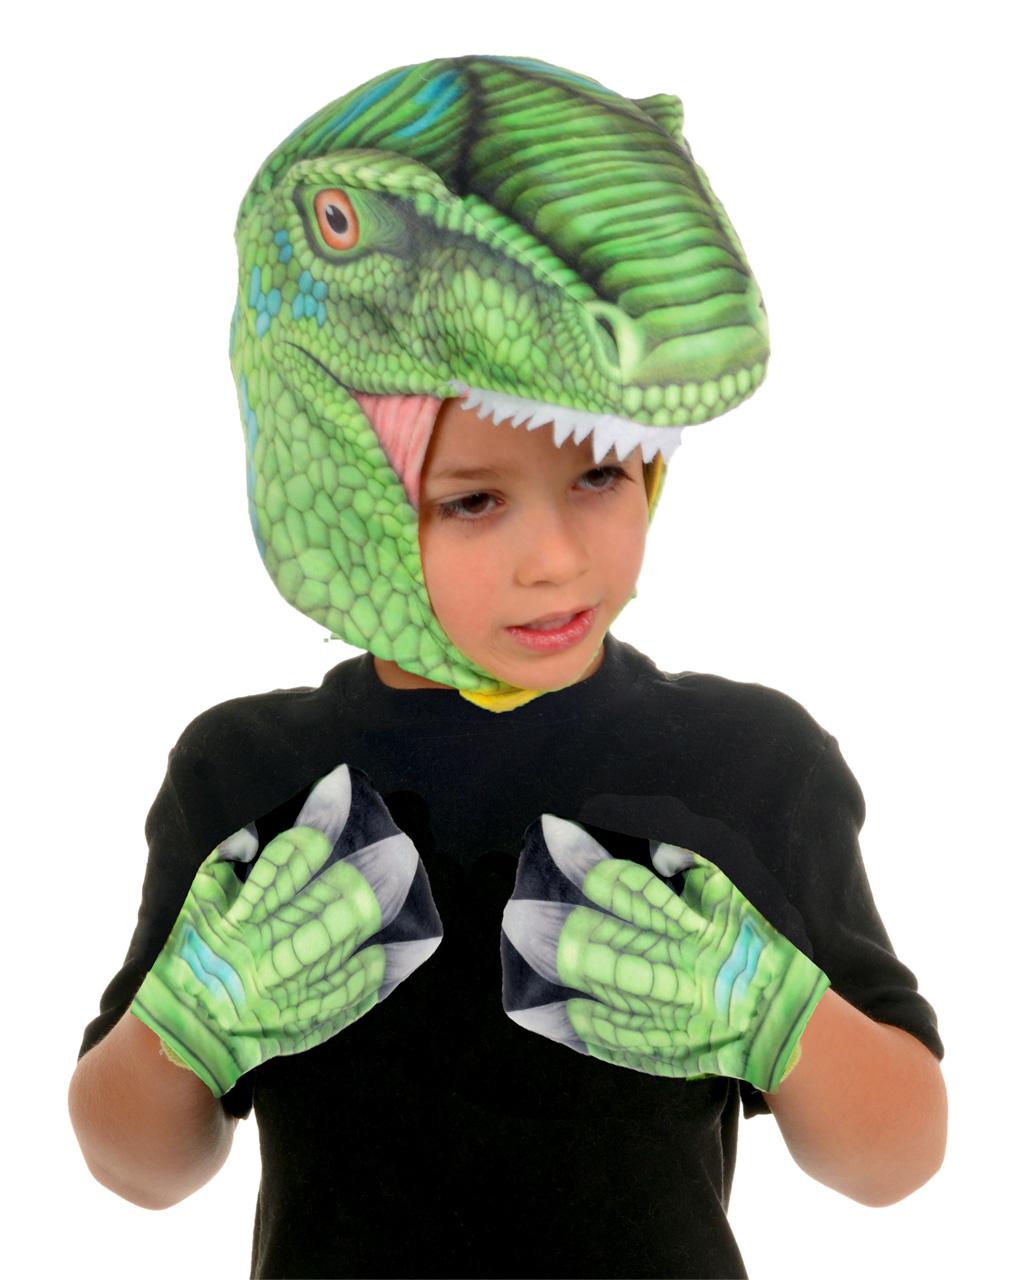 Magic Comic Zorro Funny Fancy Dress Kit Sets Men Kids Accessories Hat Gloves